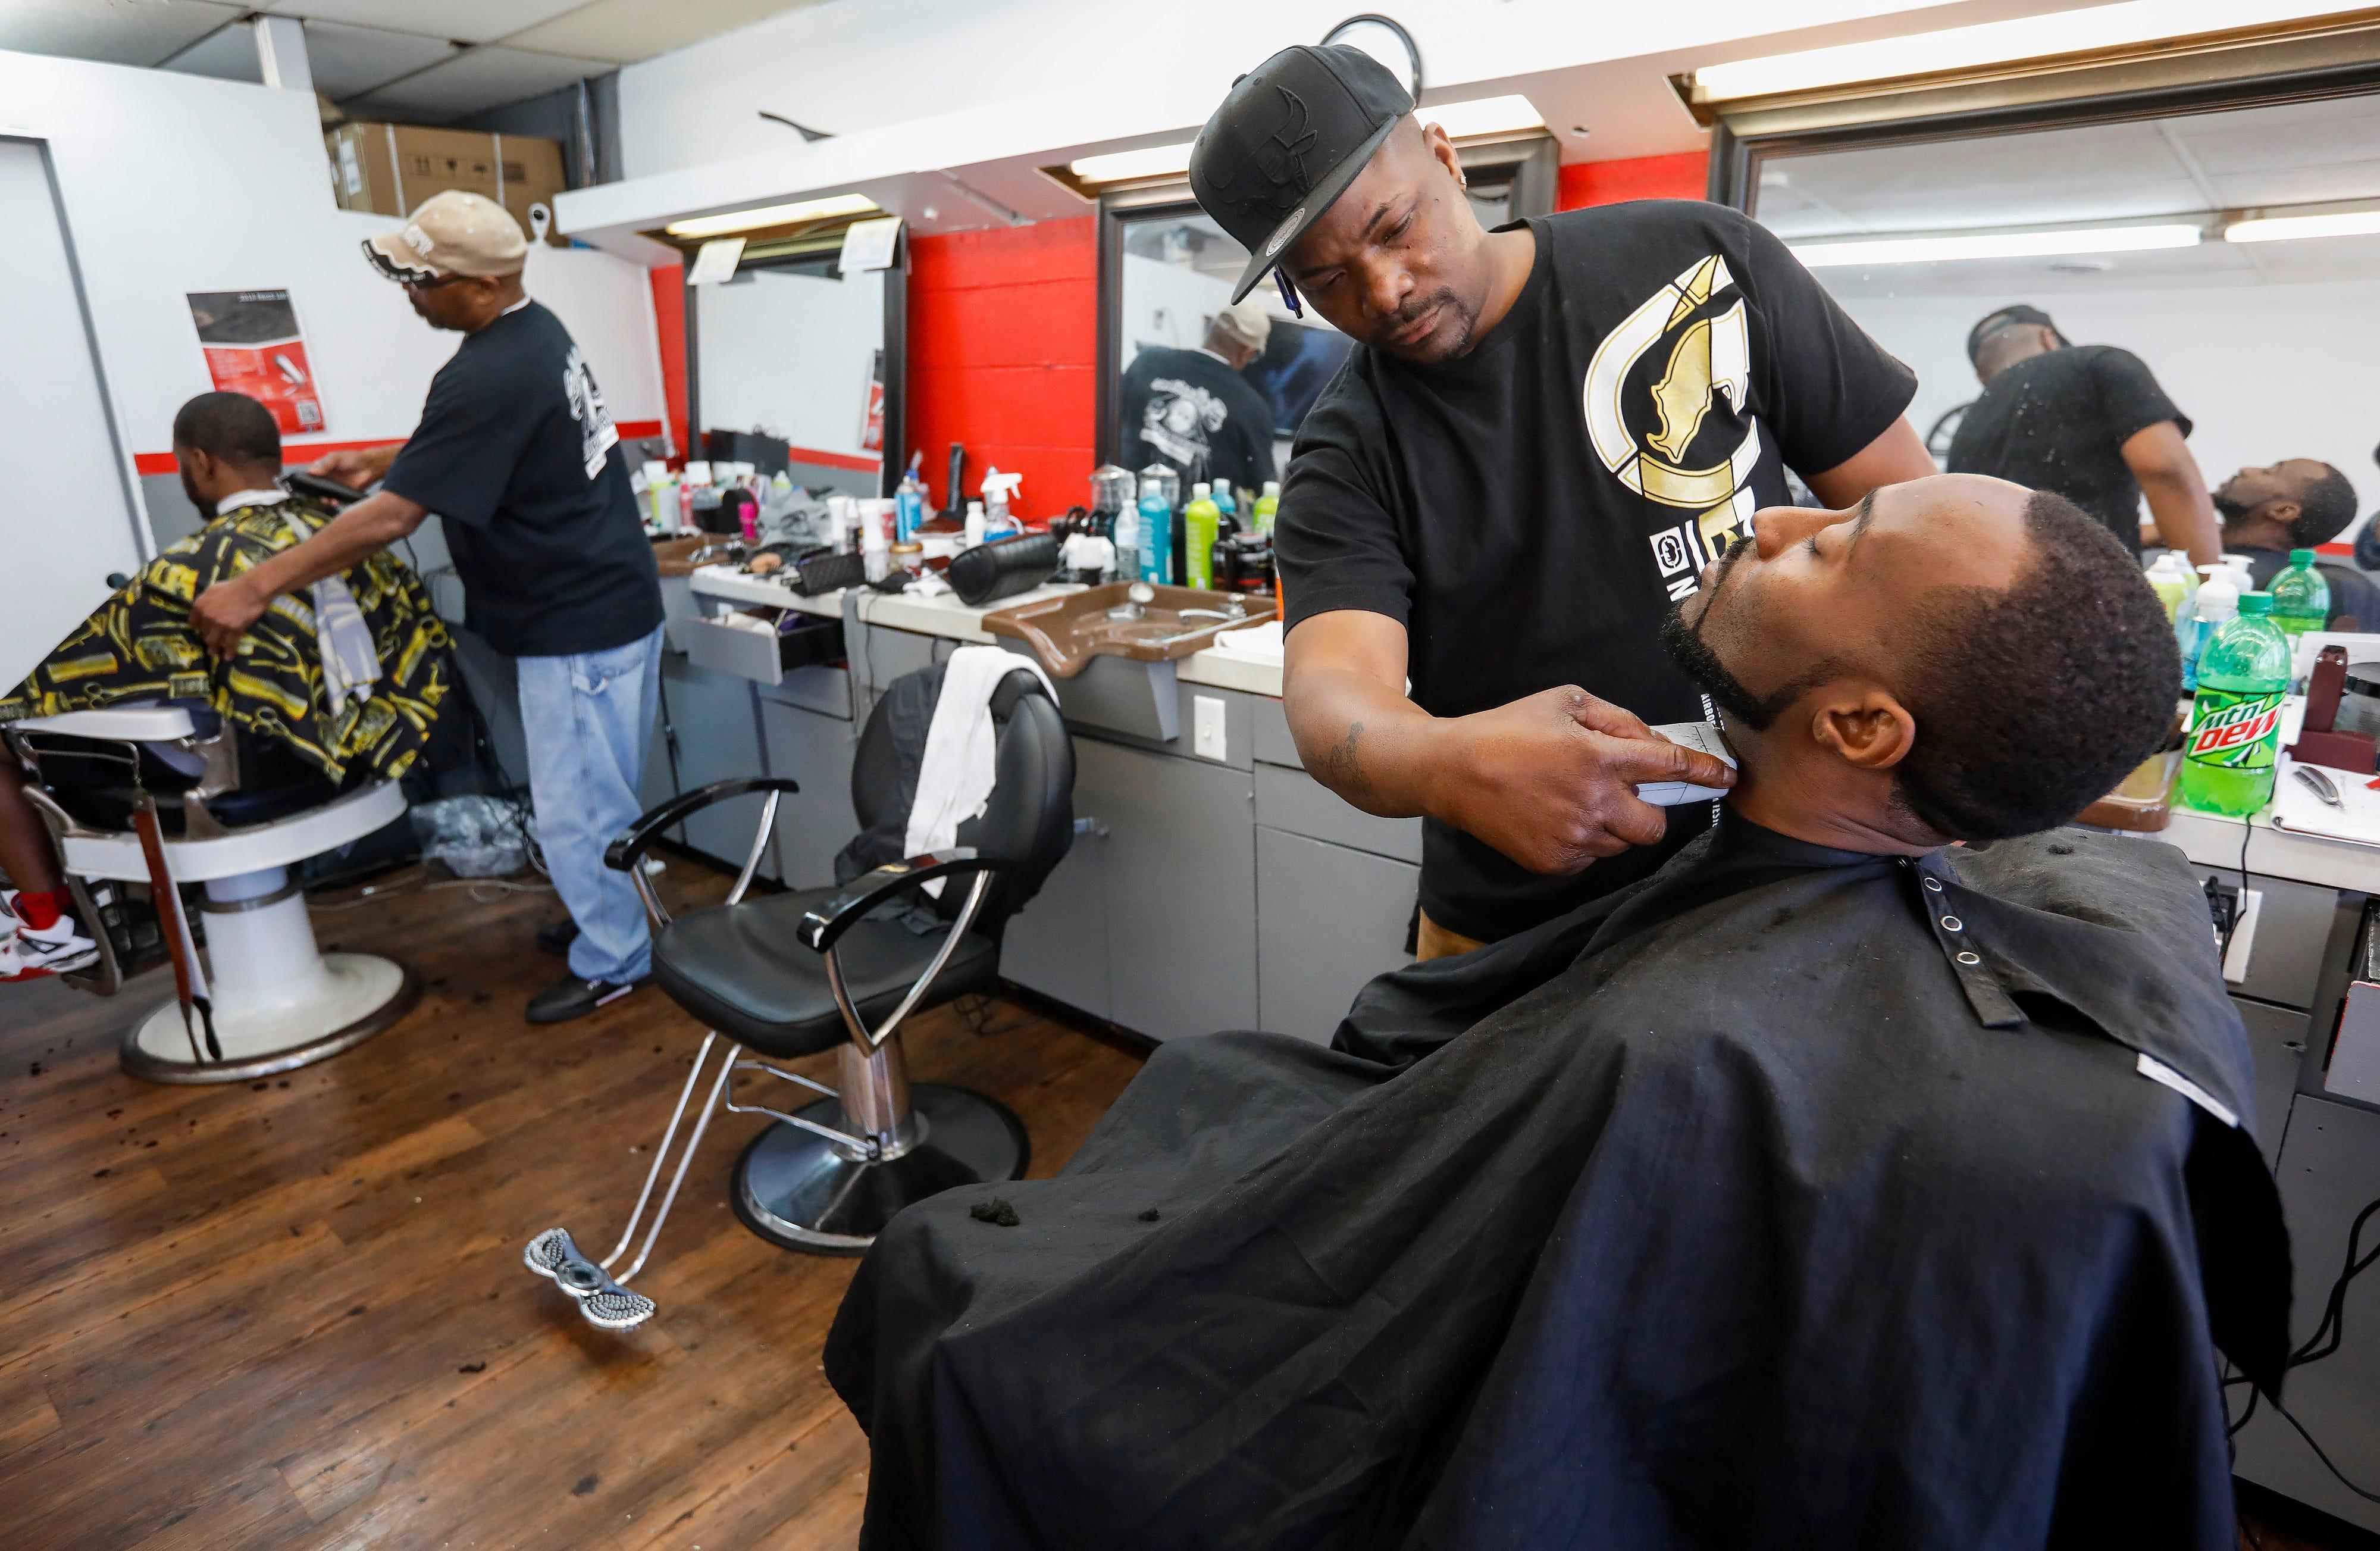 Coronavirus Springfield barbers, hair salons close due to COVID 9